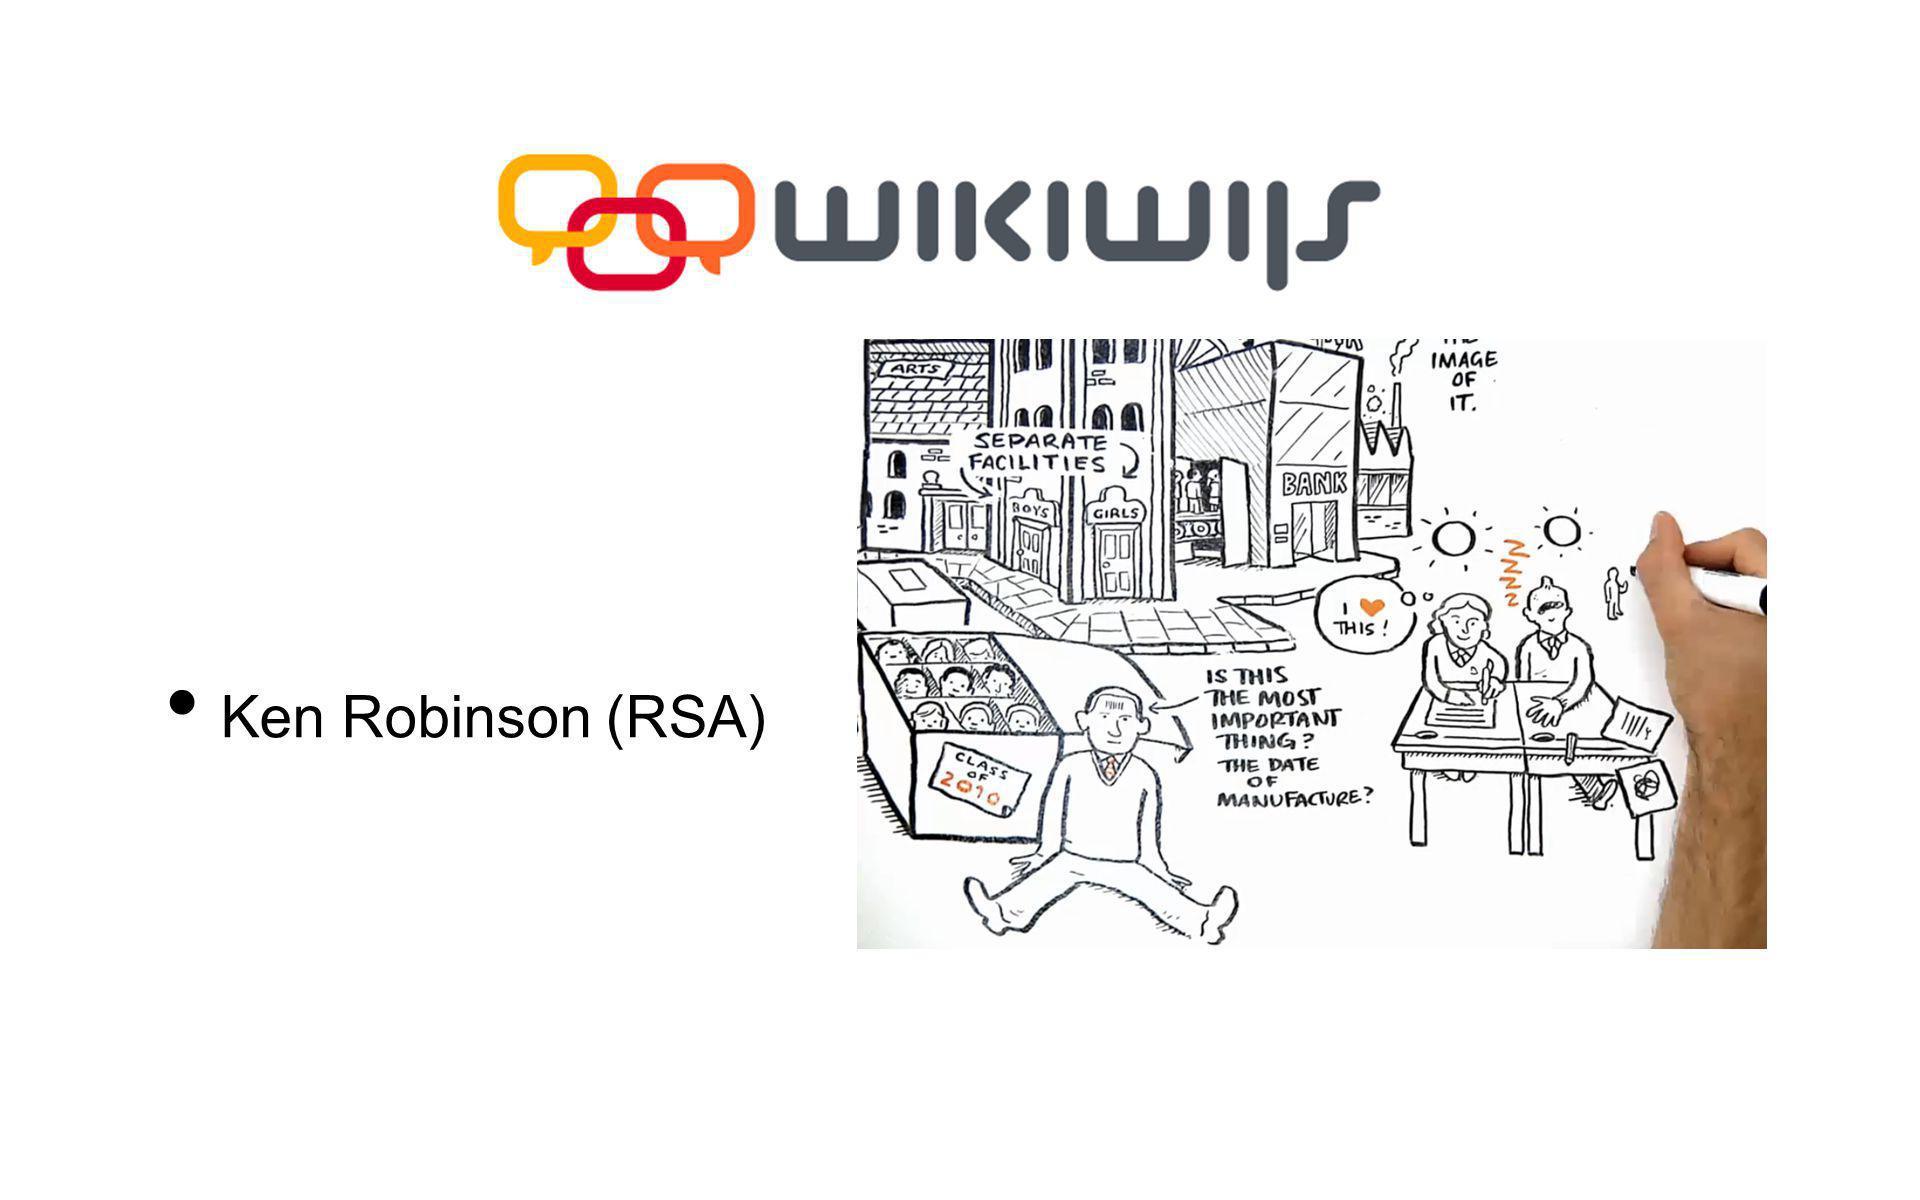 Ken Robinson (RSA)